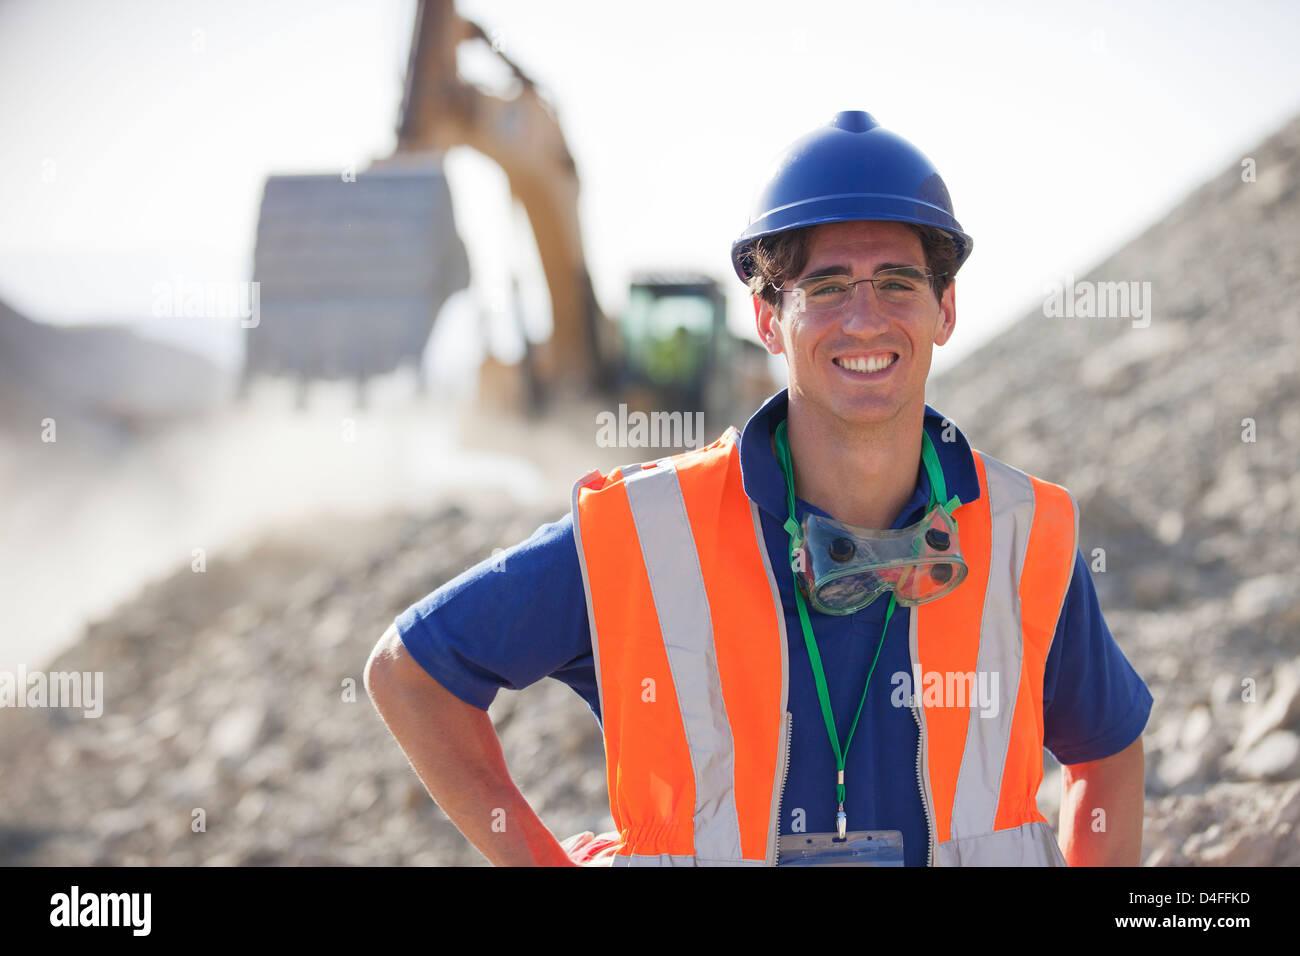 Lavoratore sorridente in cava Immagini Stock